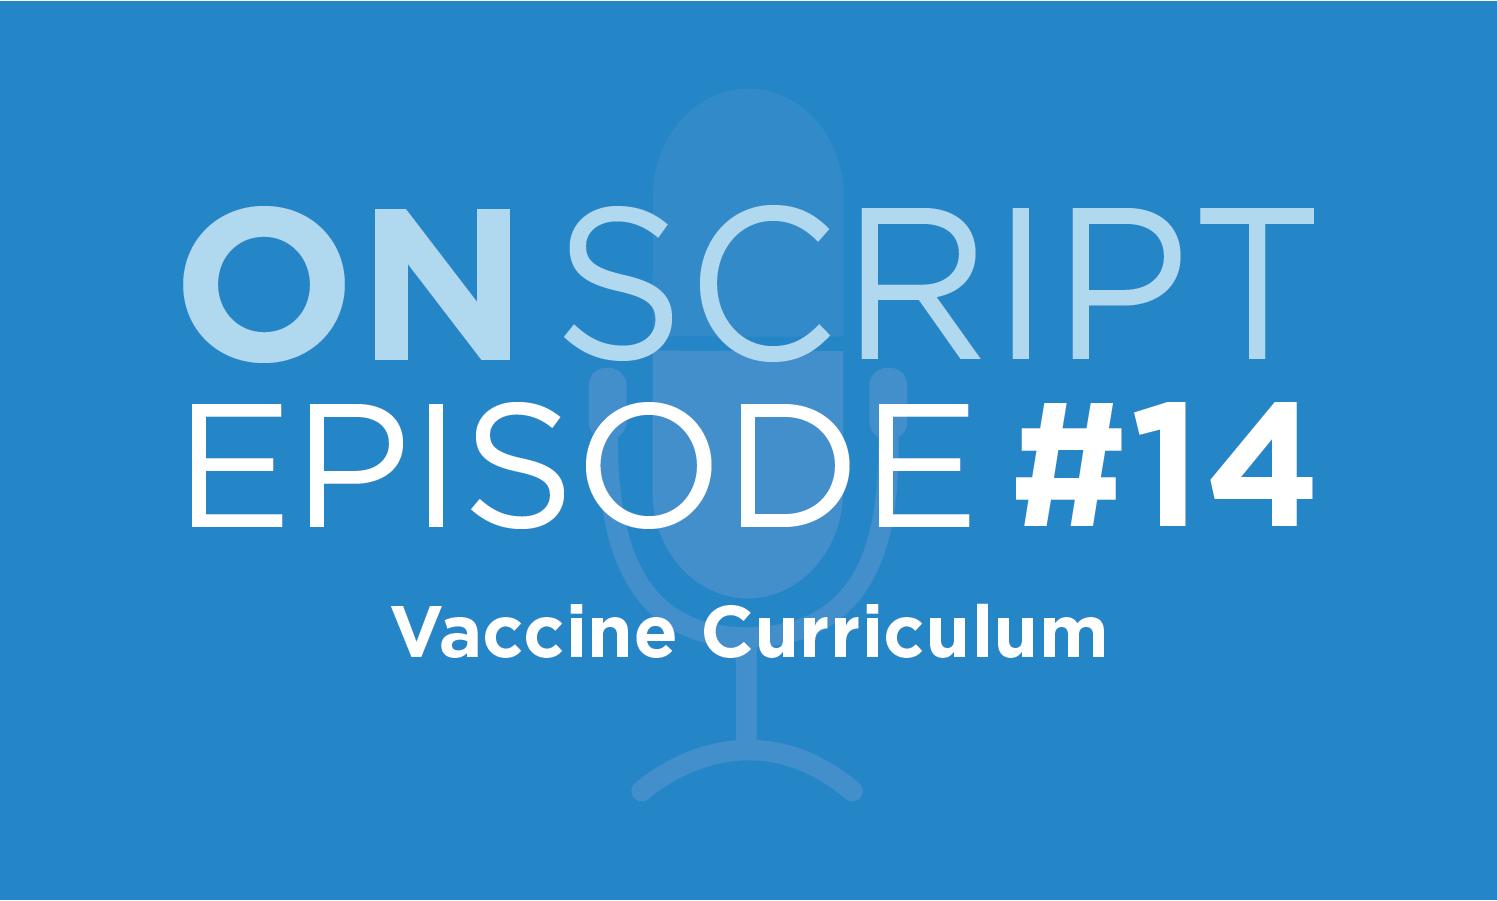 OnScript episode #14